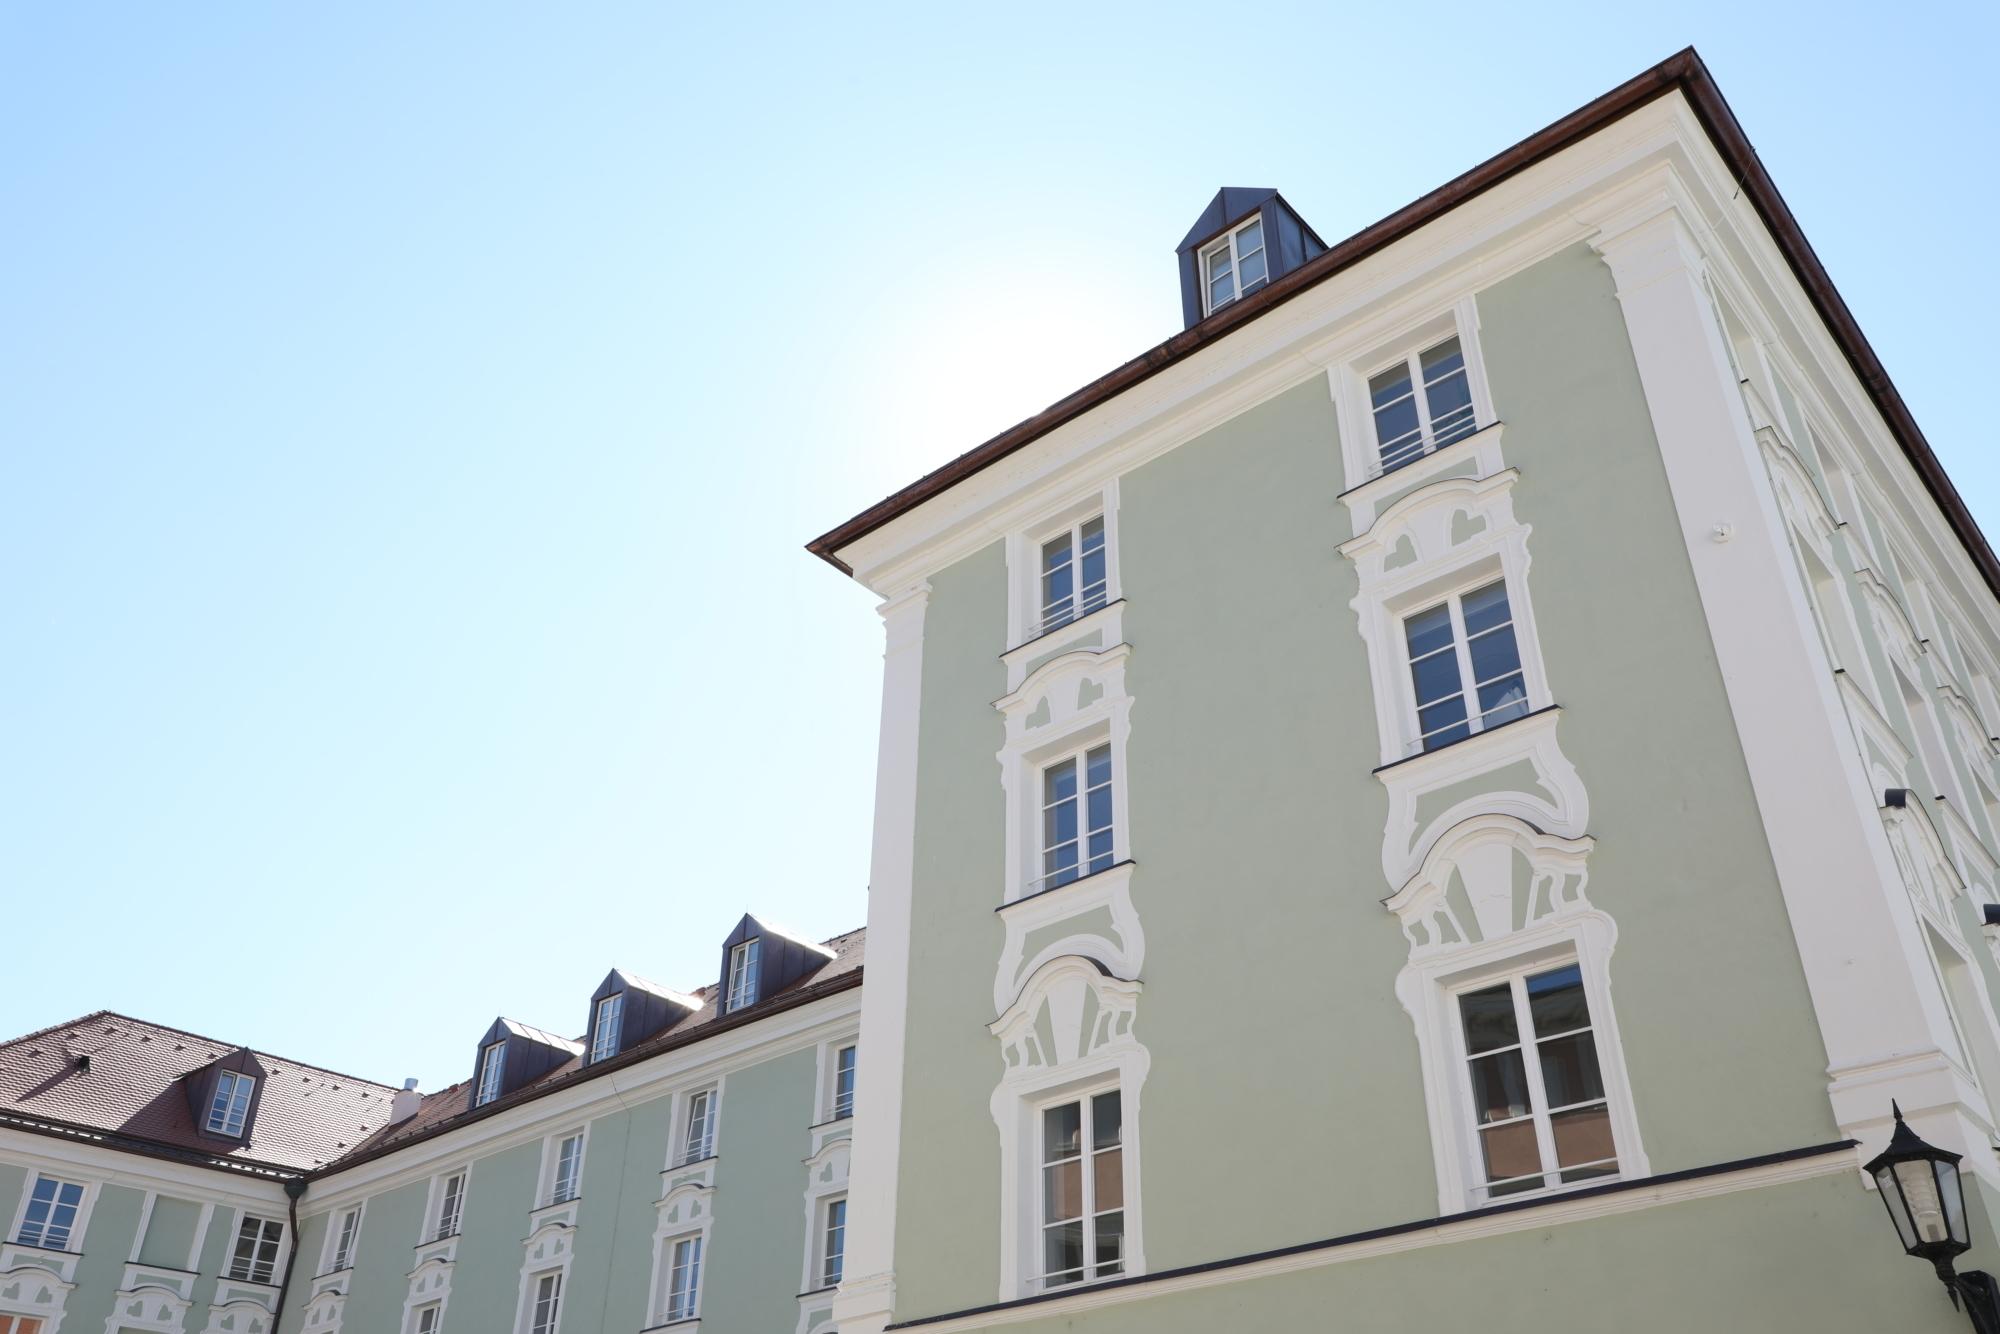 St Max Passau